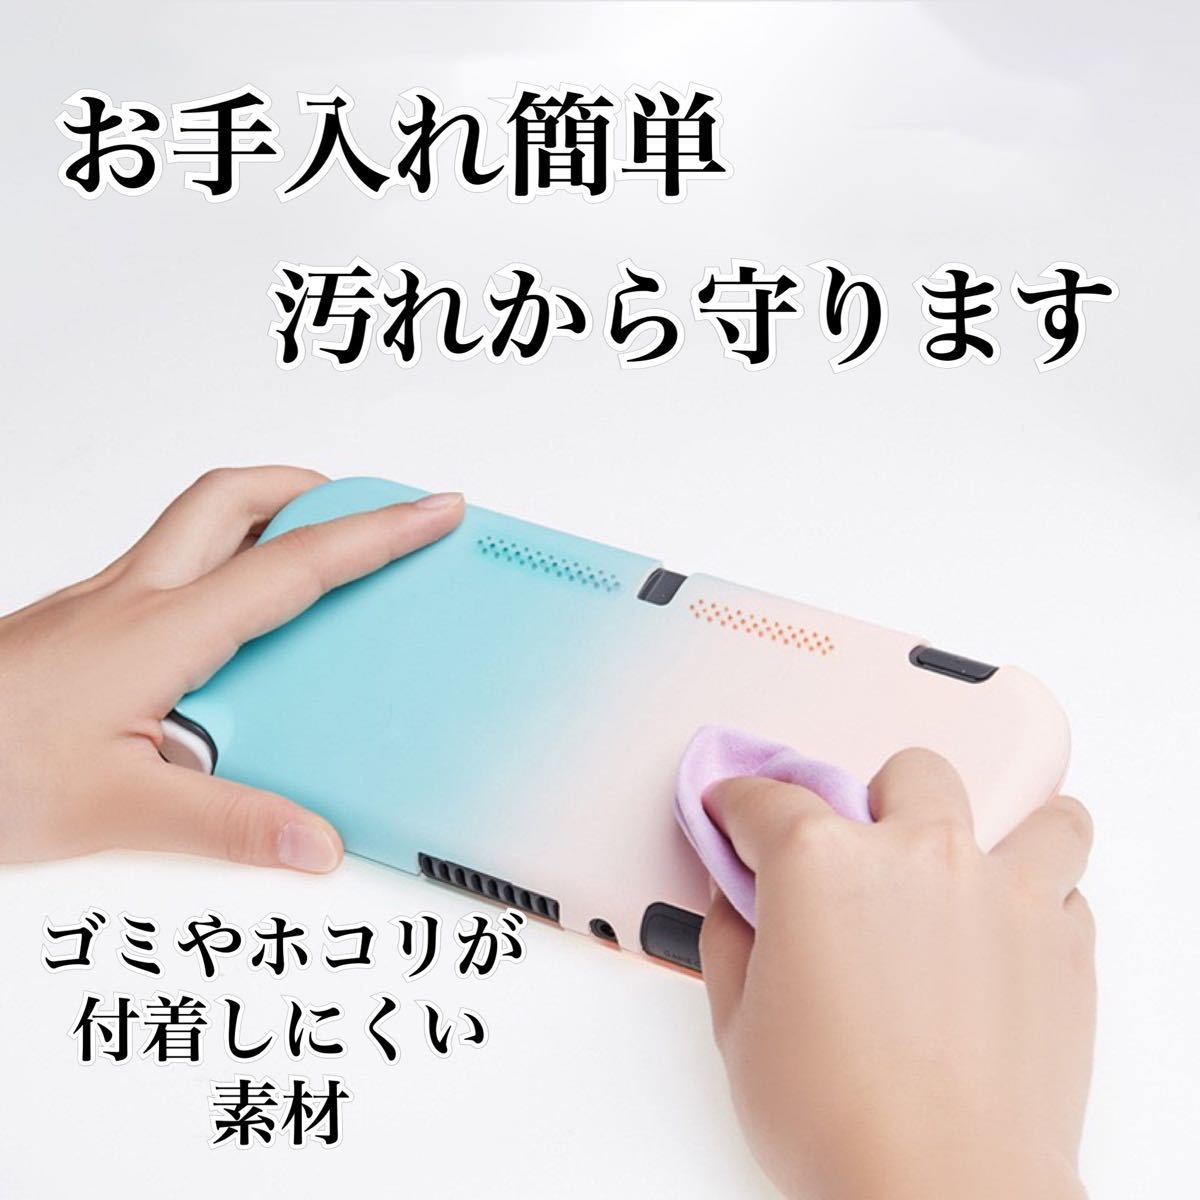 Switch  Lite  保護  カバー  スウィッチ ライト ケース  新品 未使用 傷 衝撃 スティックカバー